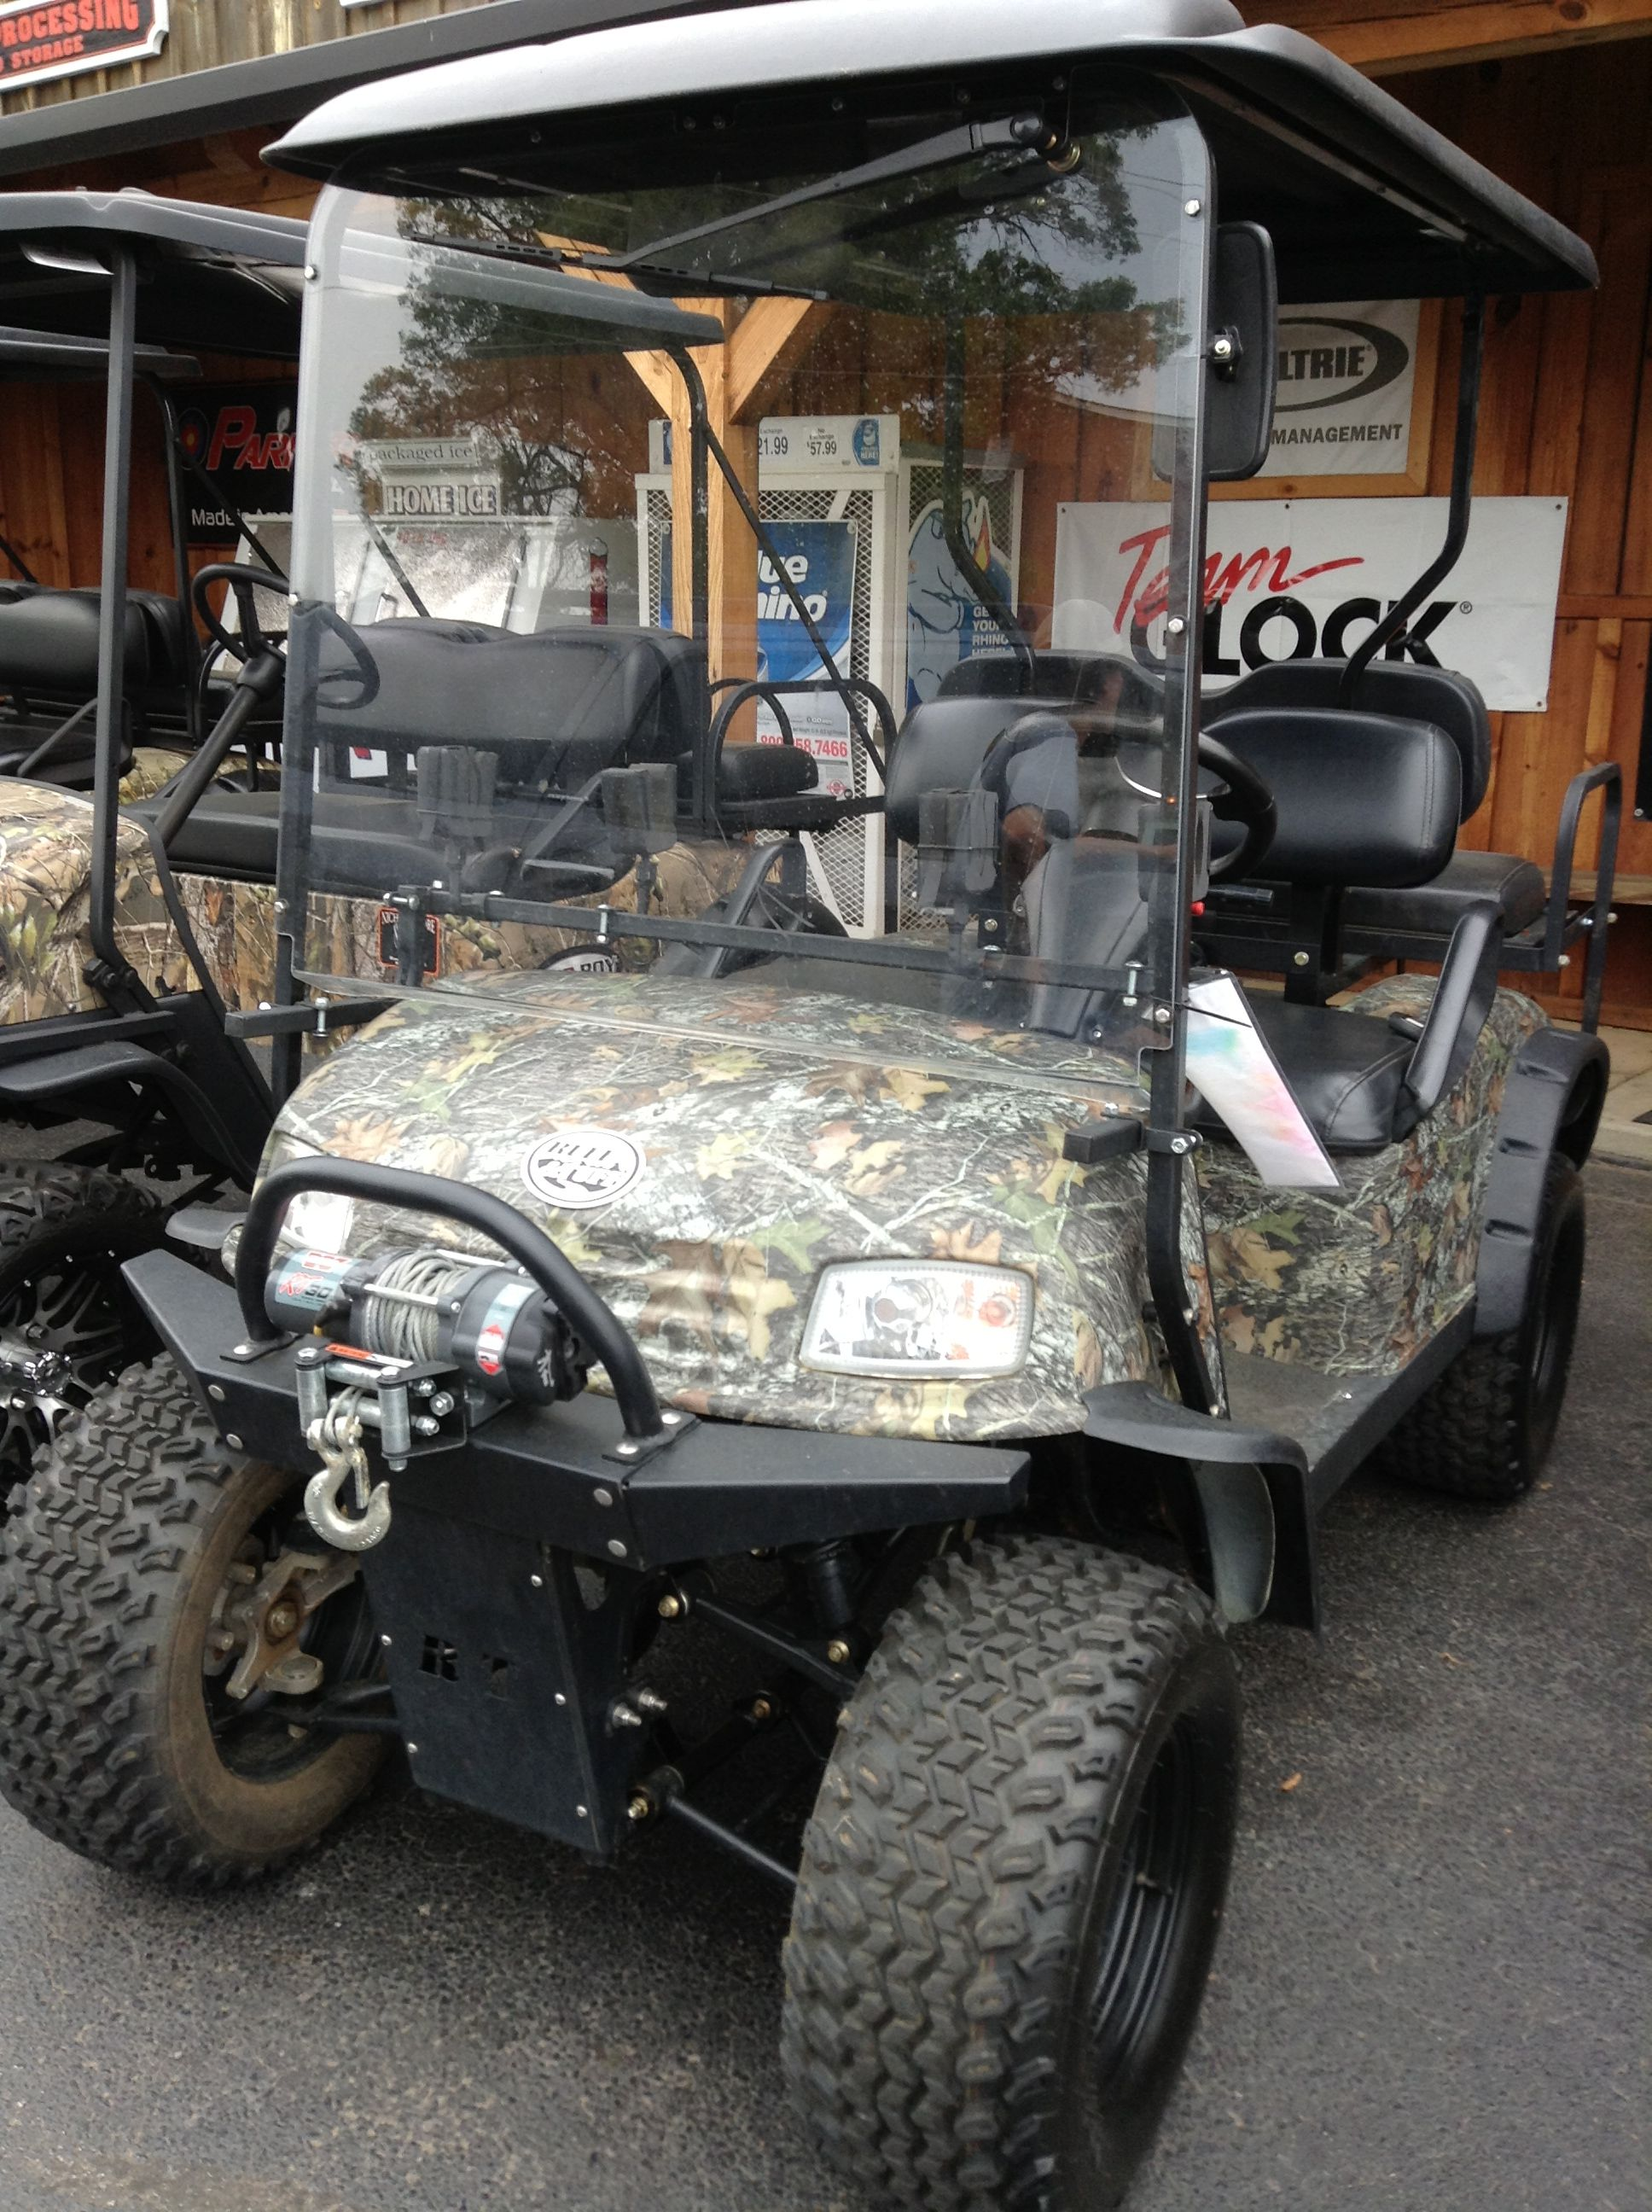 2009 Lsv Ruff Tuff Hunting Cart Equipped With Gun Rack Flip Seat